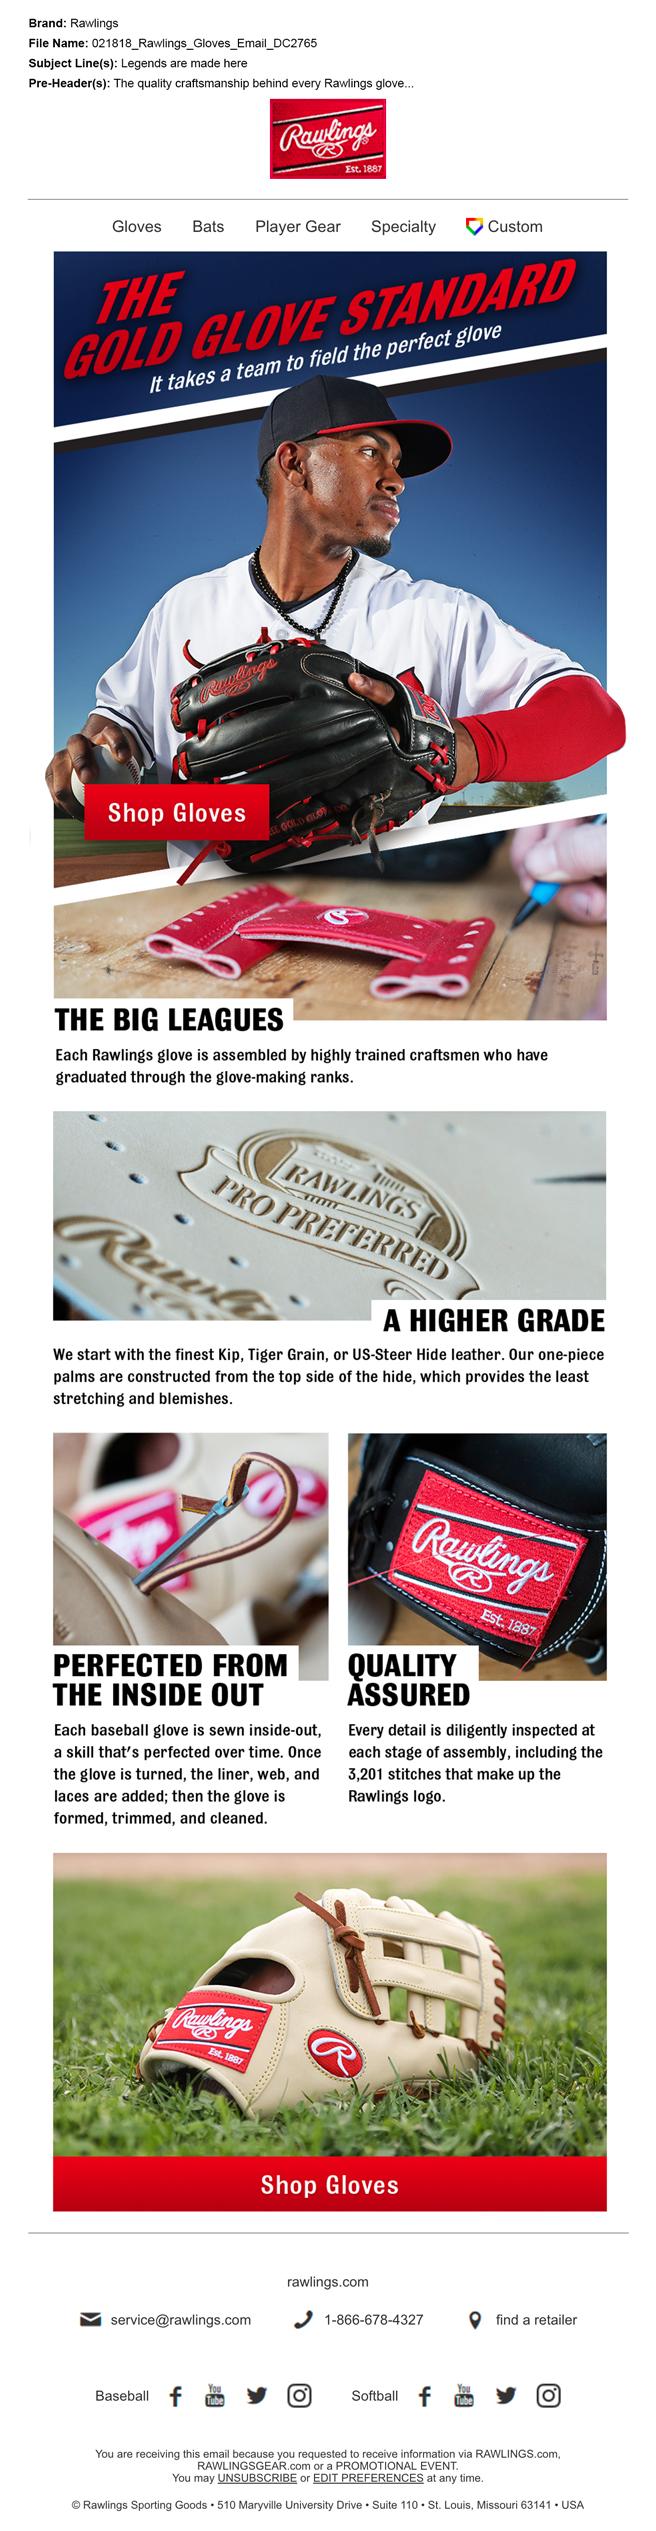 Rawlings_Legends Email.jpg